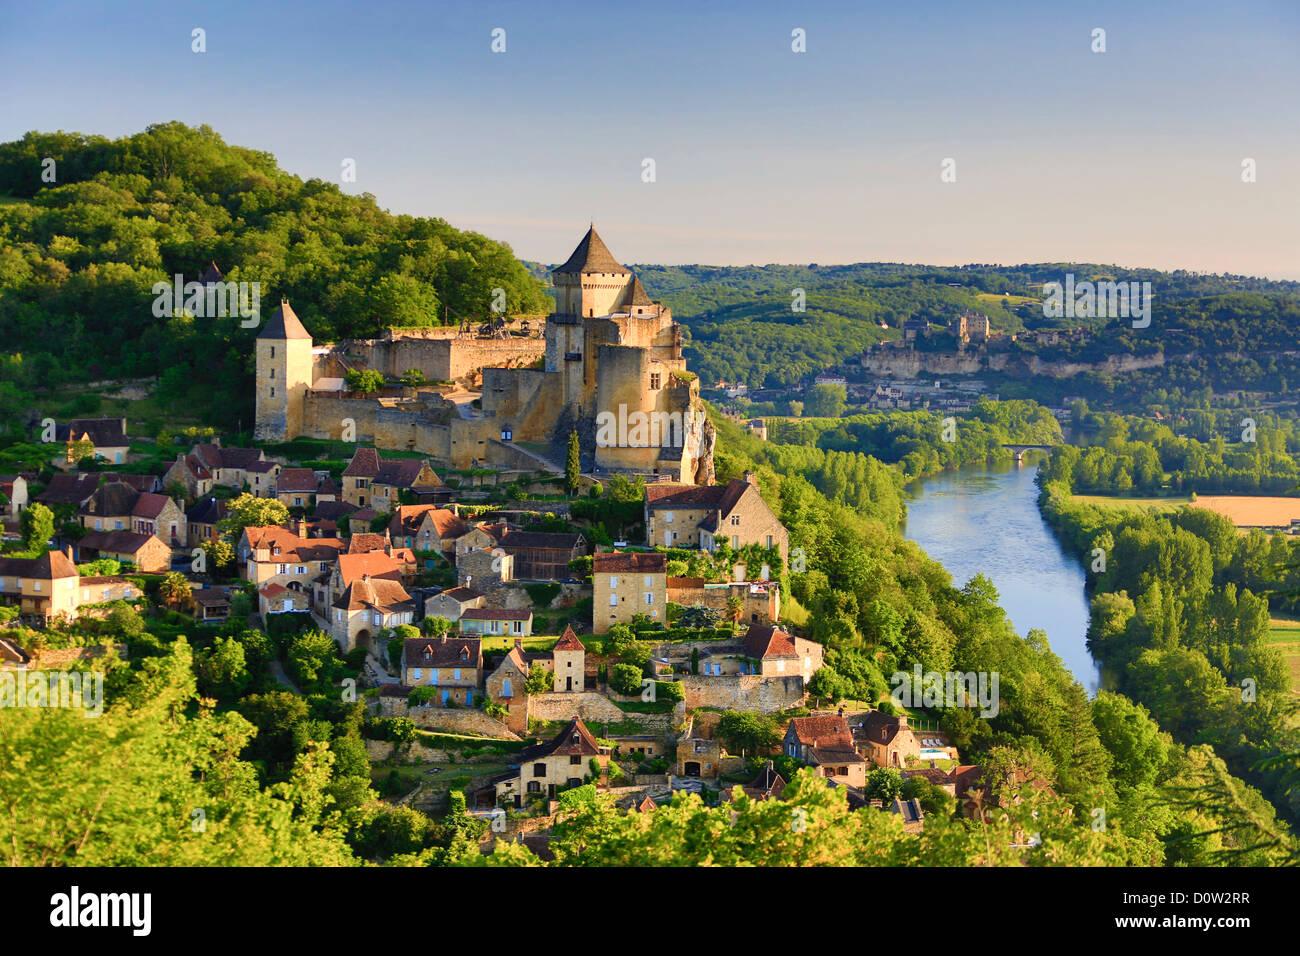 France, Europe, travel, Dordogne, Castelnaud, Milandes, Castle, architecture, medieval, skyline, steep, rocks, tower, Stock Photo